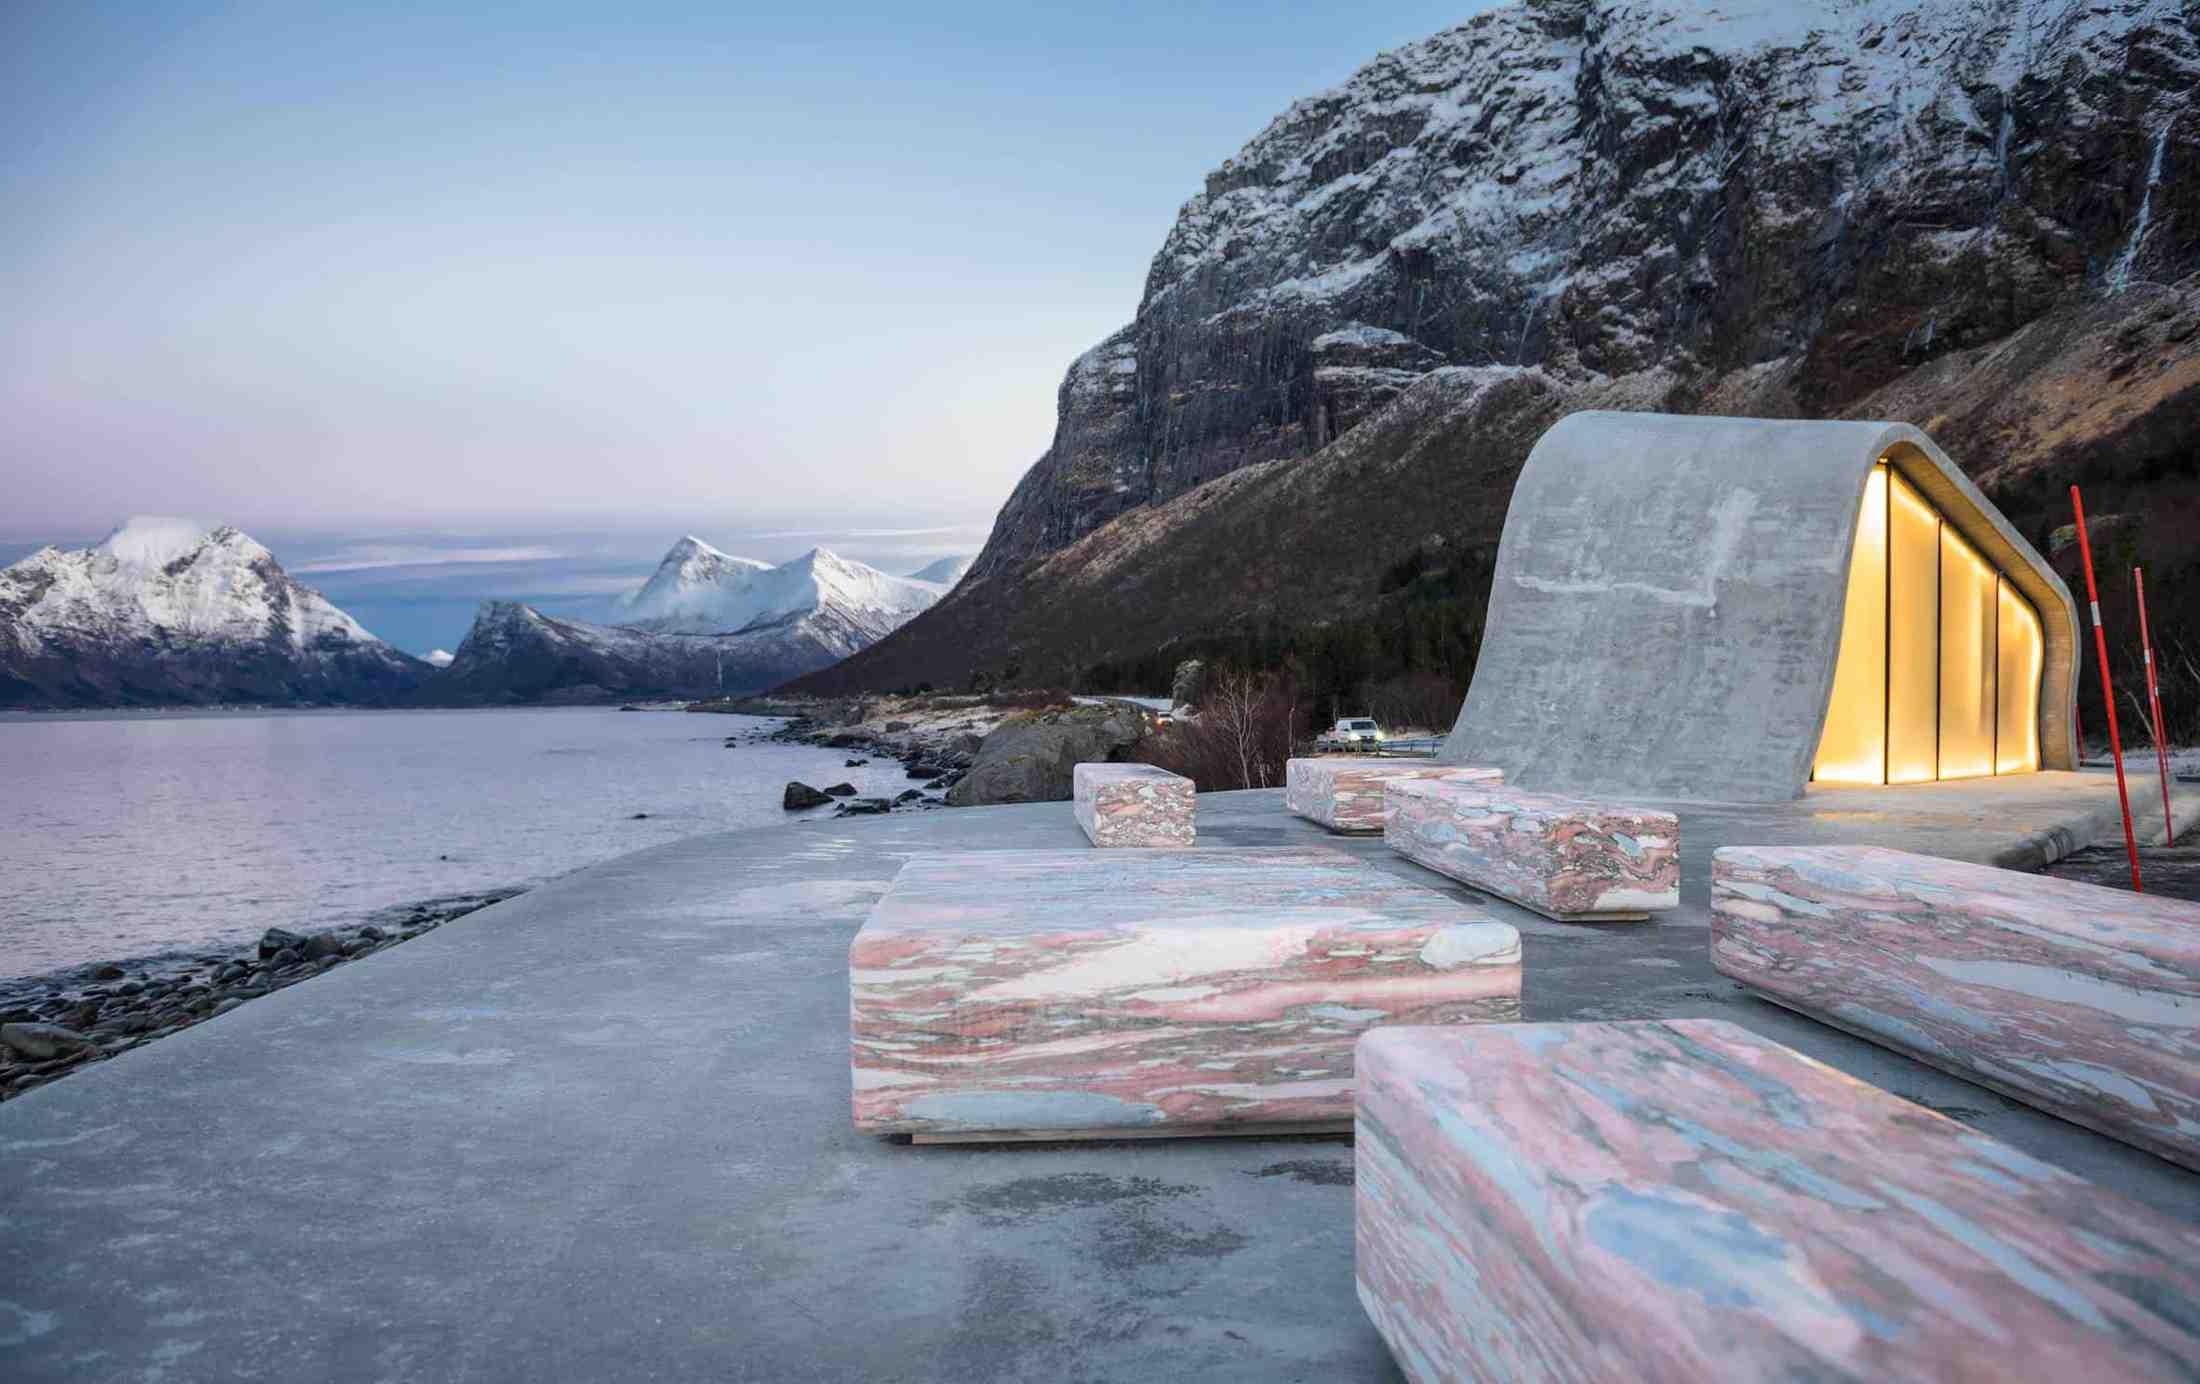 haugen zohar arkitekter hza wave shaped toilet facility norwegian scenic route 11